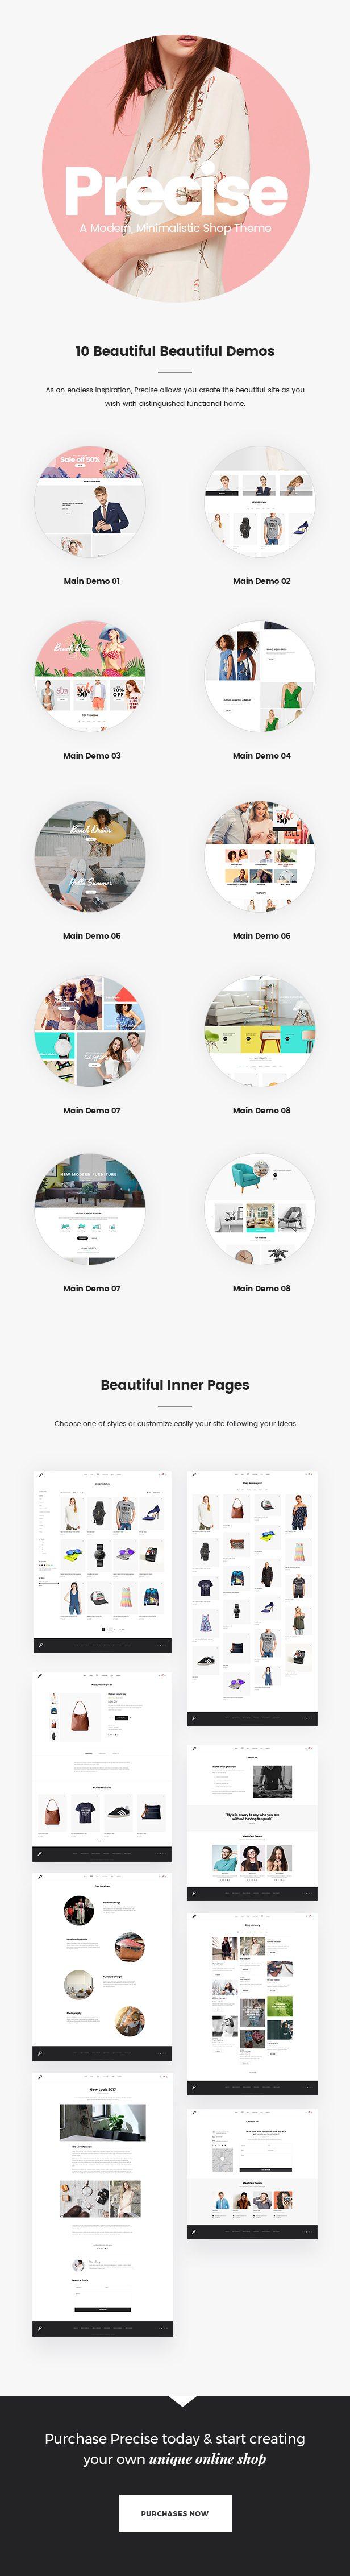 Precise - A Modern, Minimalistic Shop Theme - 1